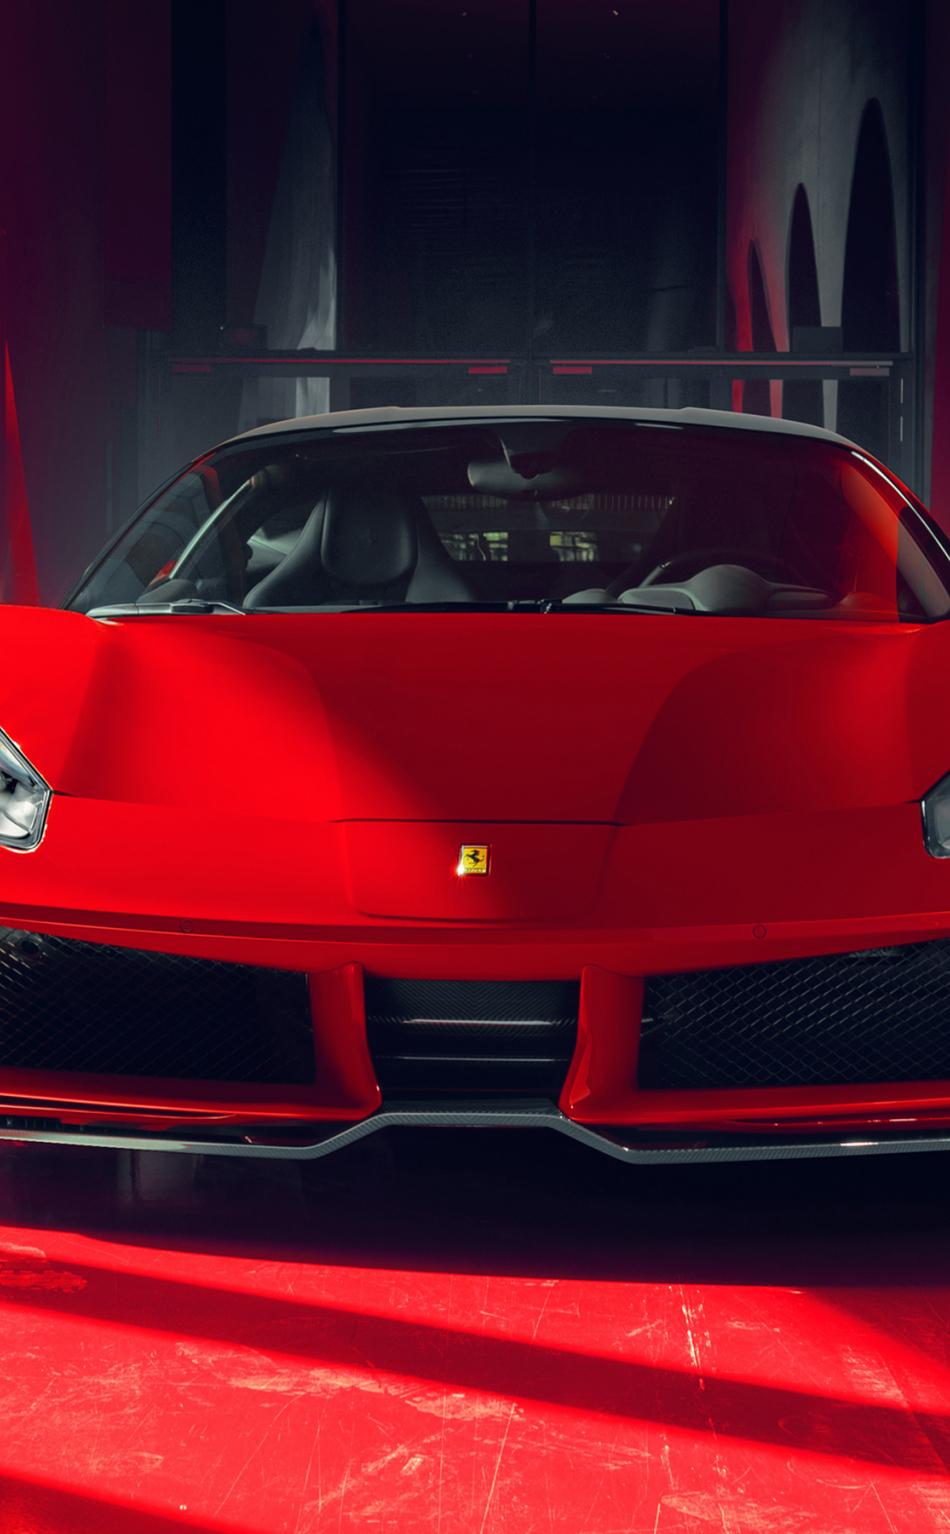 Download 950x1534 Wallpaper 2018 Pogea Racing Fplus Corsa Ferrari 488 Gtb Front Iphone 950x1534 Hd Image Background 7430